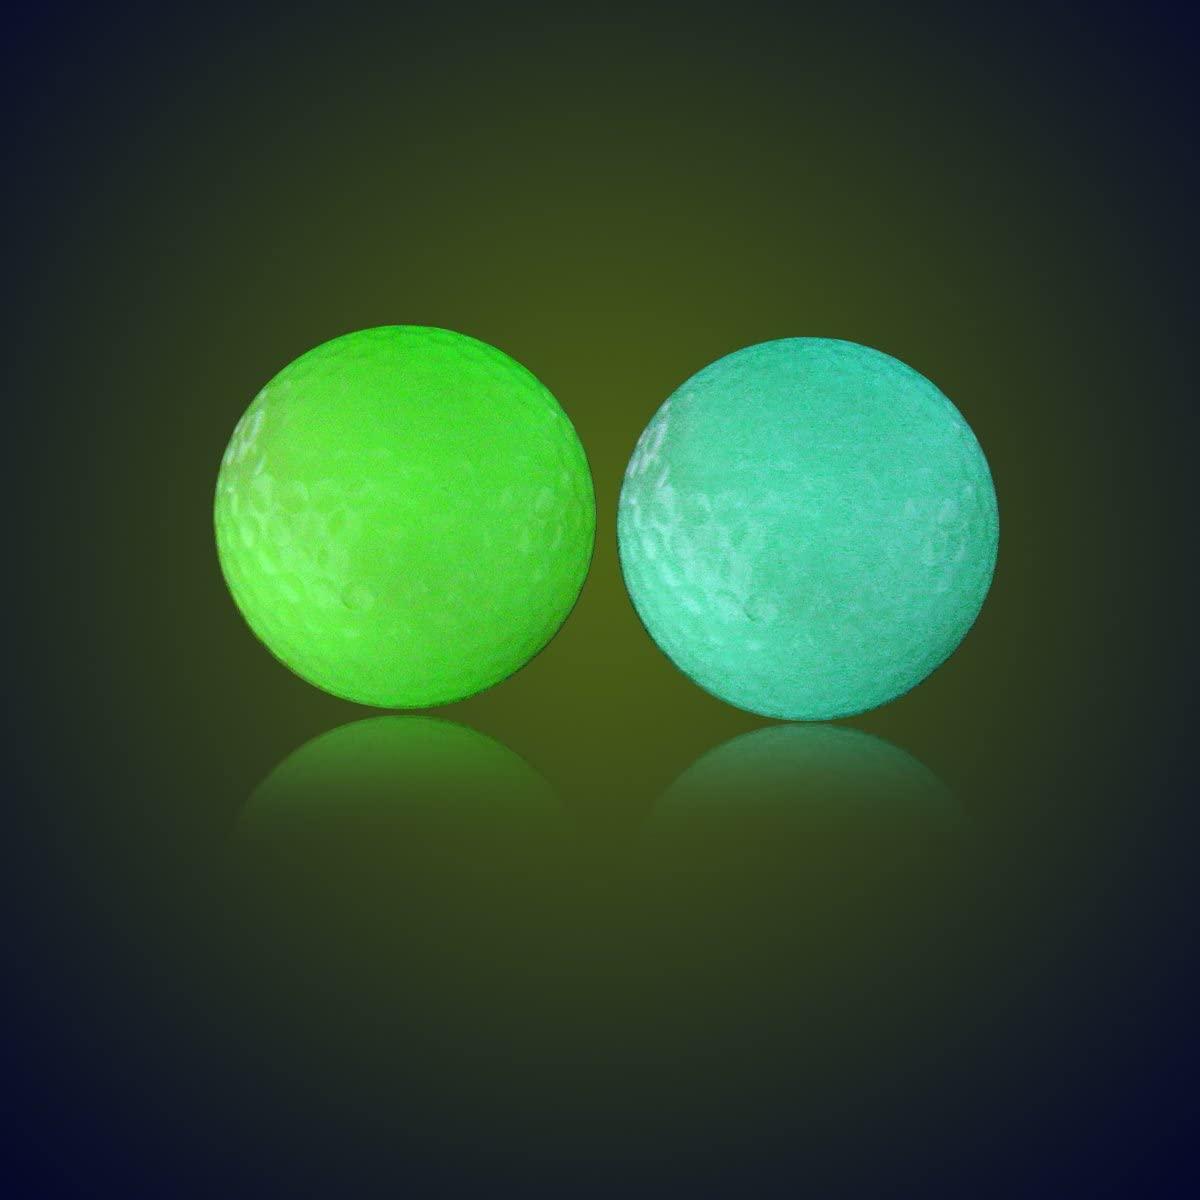 EliteShine LED Golf Balls 4